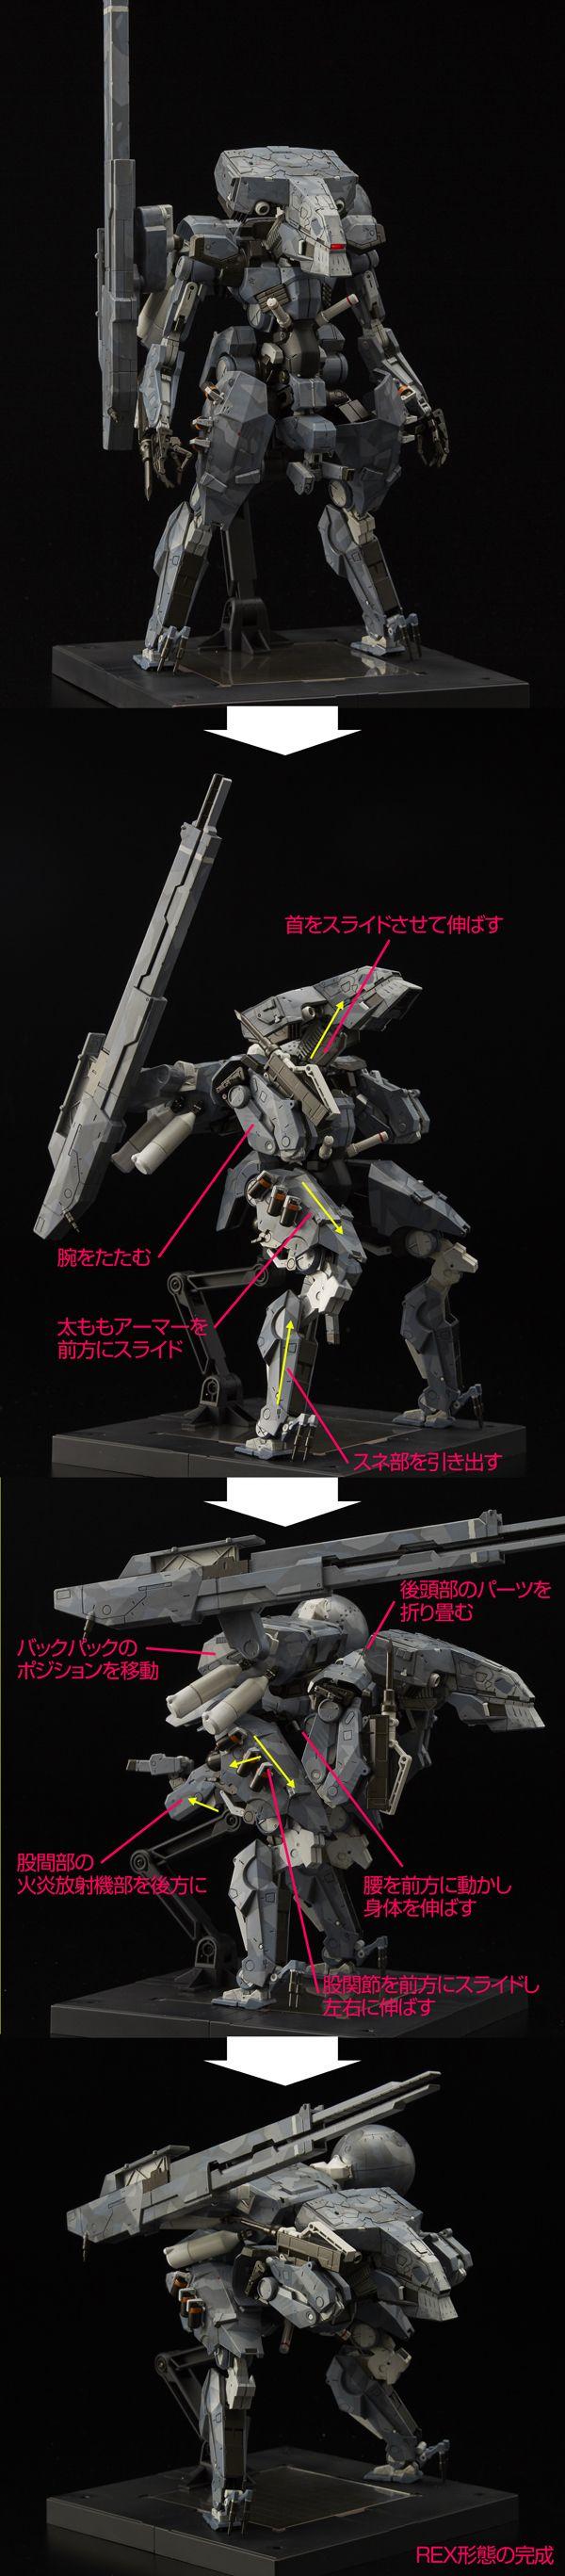 "[METAL GEAR SOLID V:THE PHANTOM PAIN] RIOBOT Series ""Metal Gear Sahelanthropus"" ""Metal Gear REX"" Full Official REVIEW, Full Info http://www.gunjap.net/site/?p=274337"